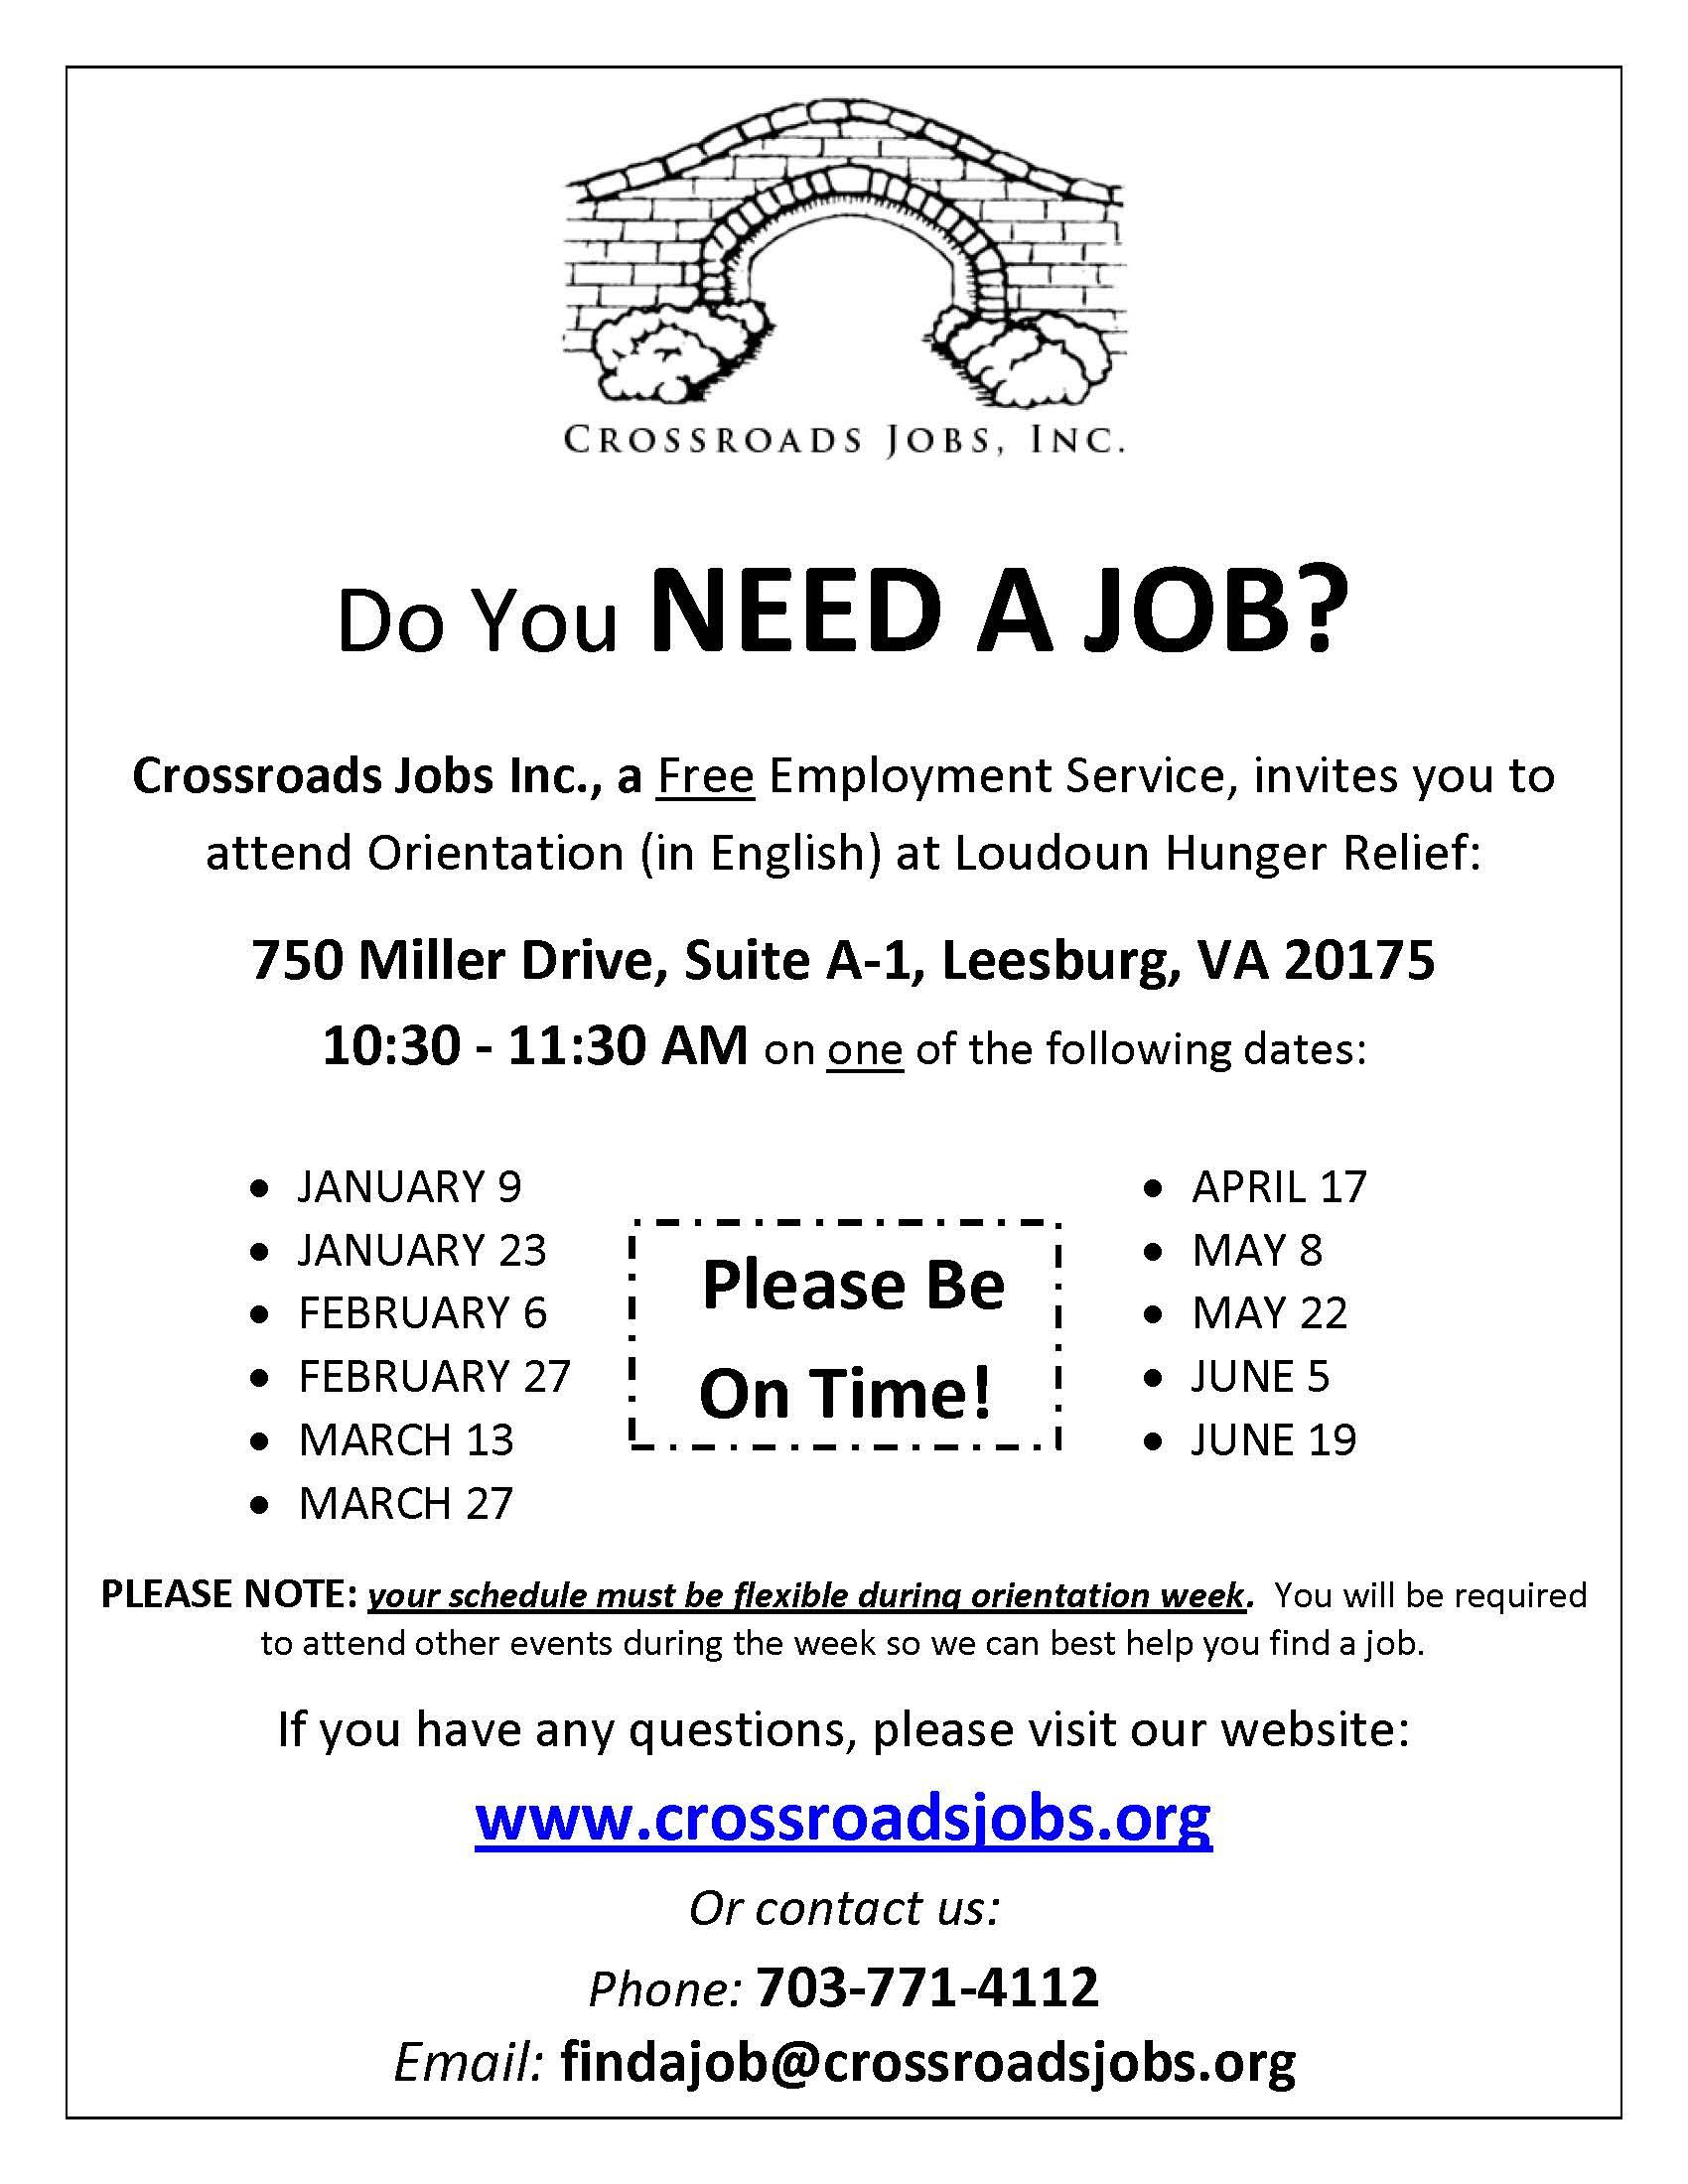 Crossroads Jobs is a free employement service in Loudoun County.